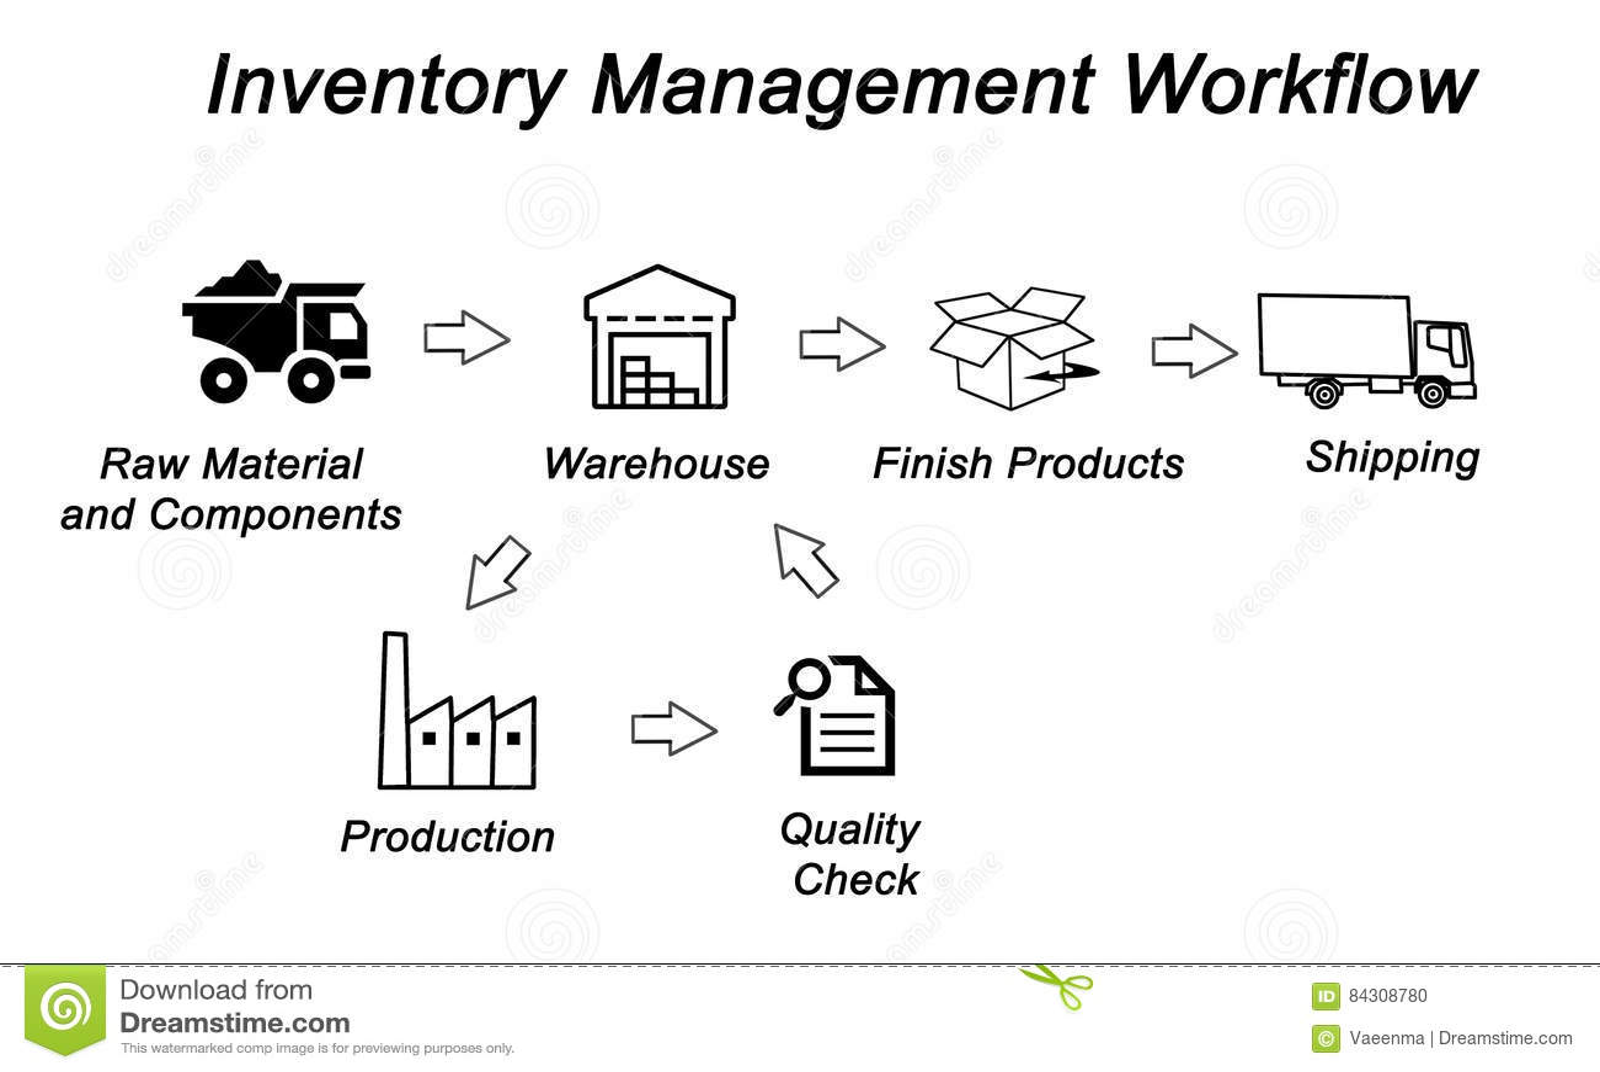 inventory control flow diagram 1996 saturn sl2 radio wiring management workflow stock illustration